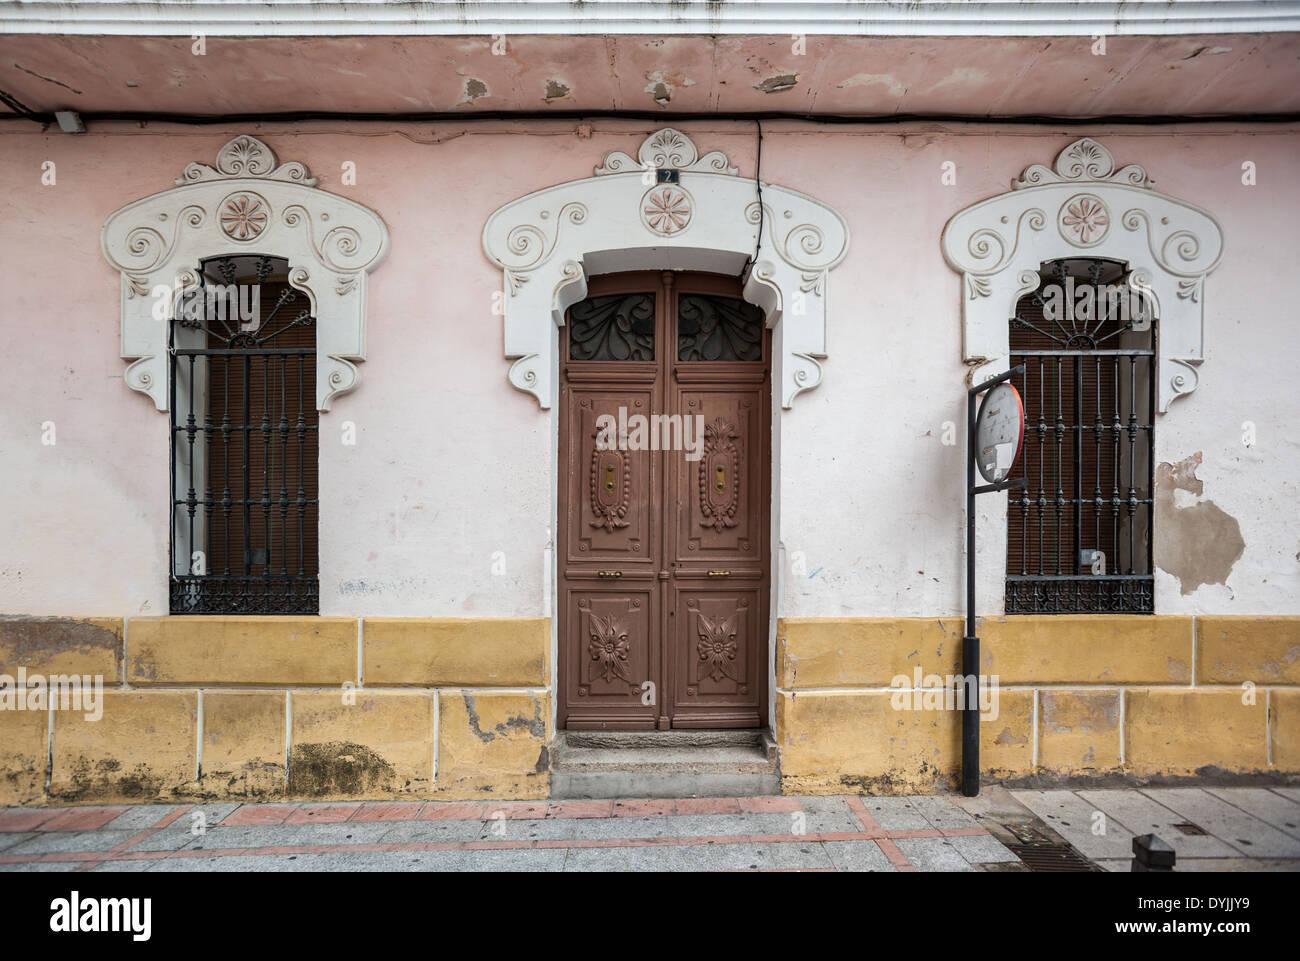 Hervas, Caceres, Extremadura, Spain, Europe - Stock Image